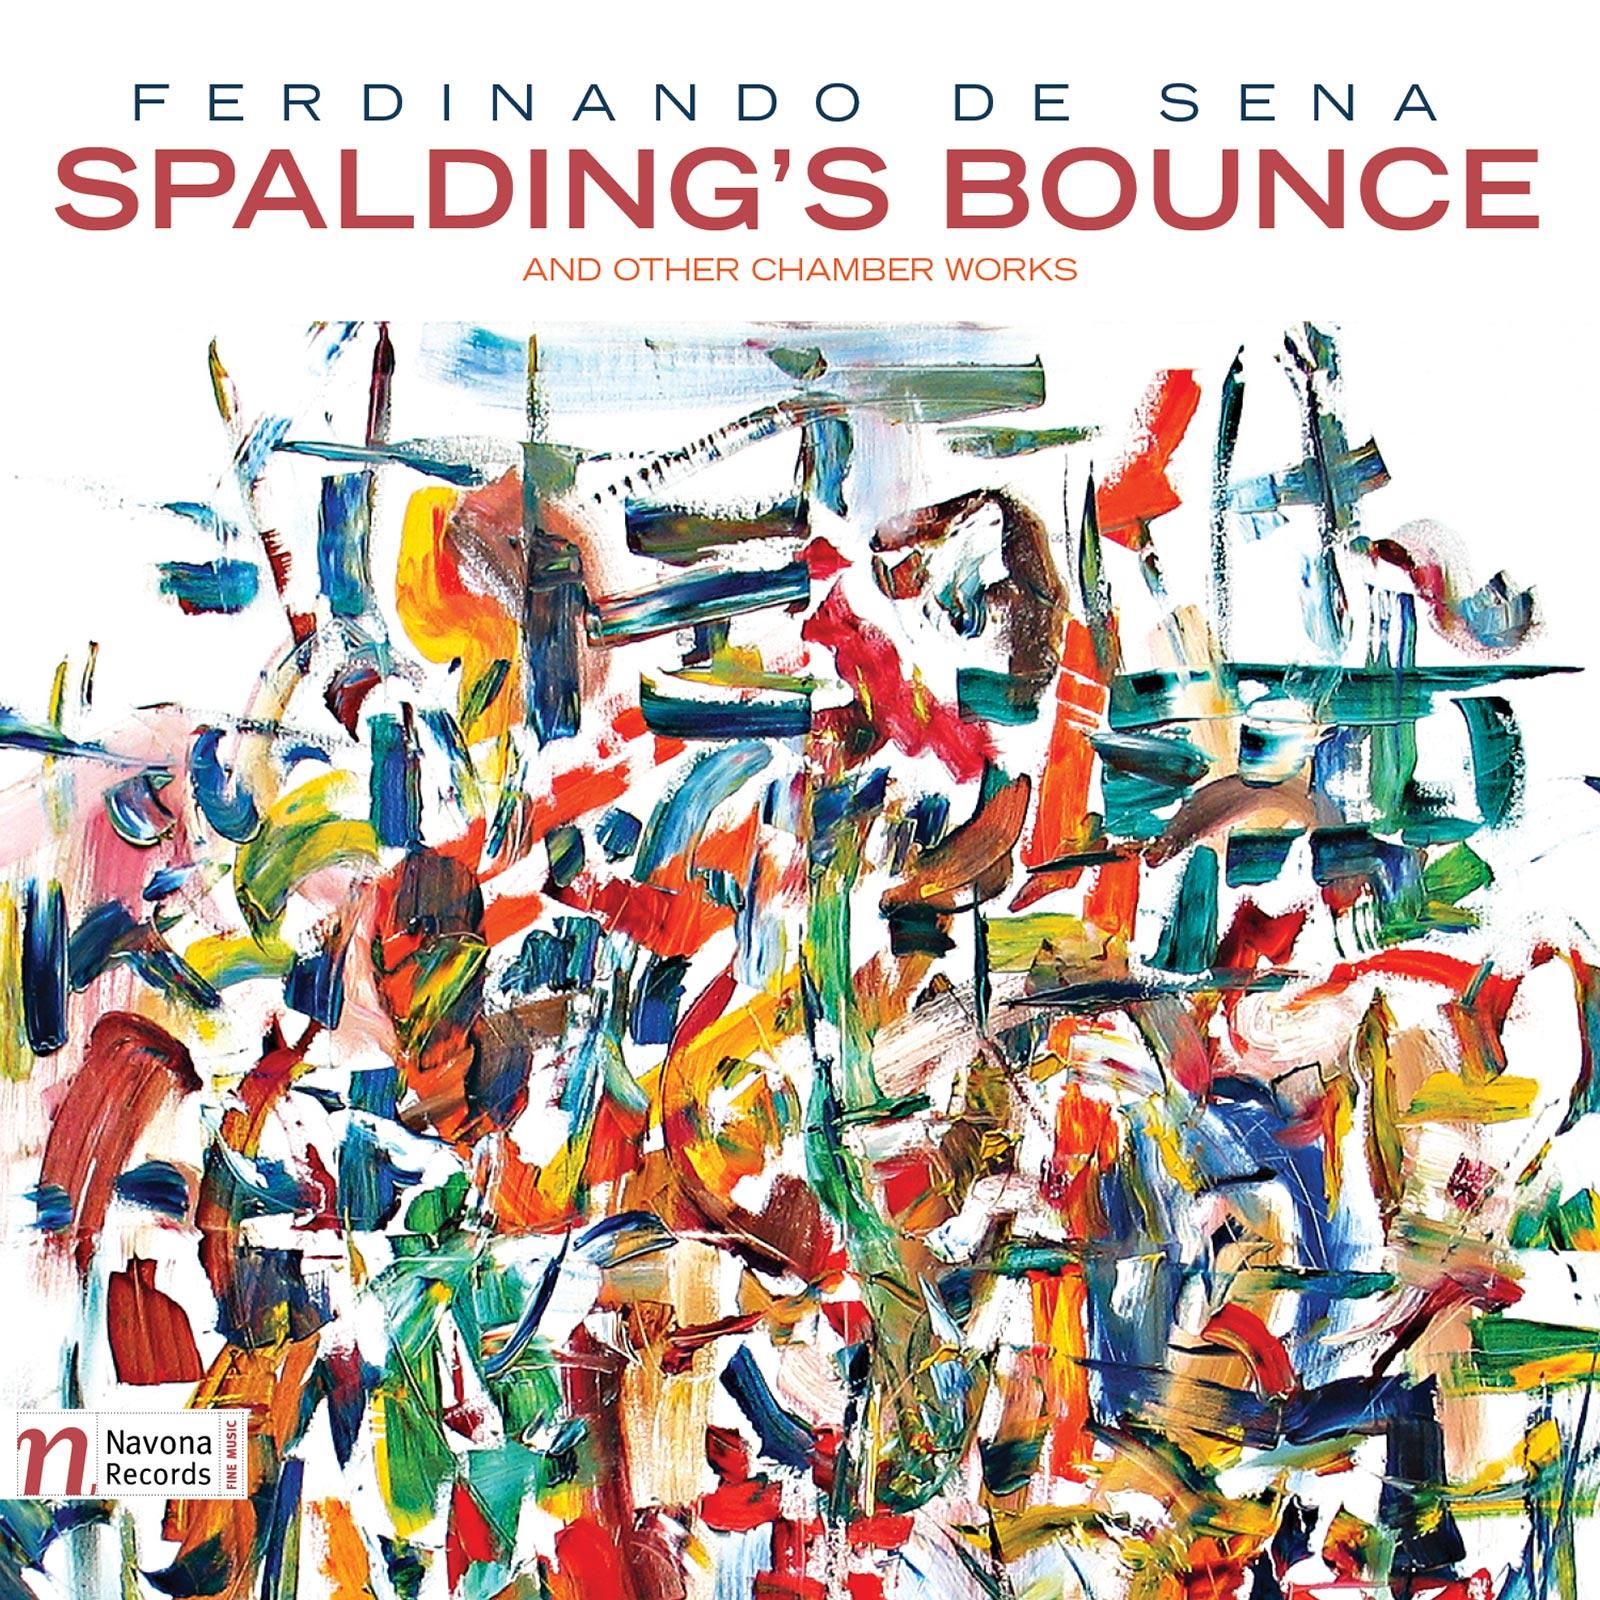 Spalding's Bounce